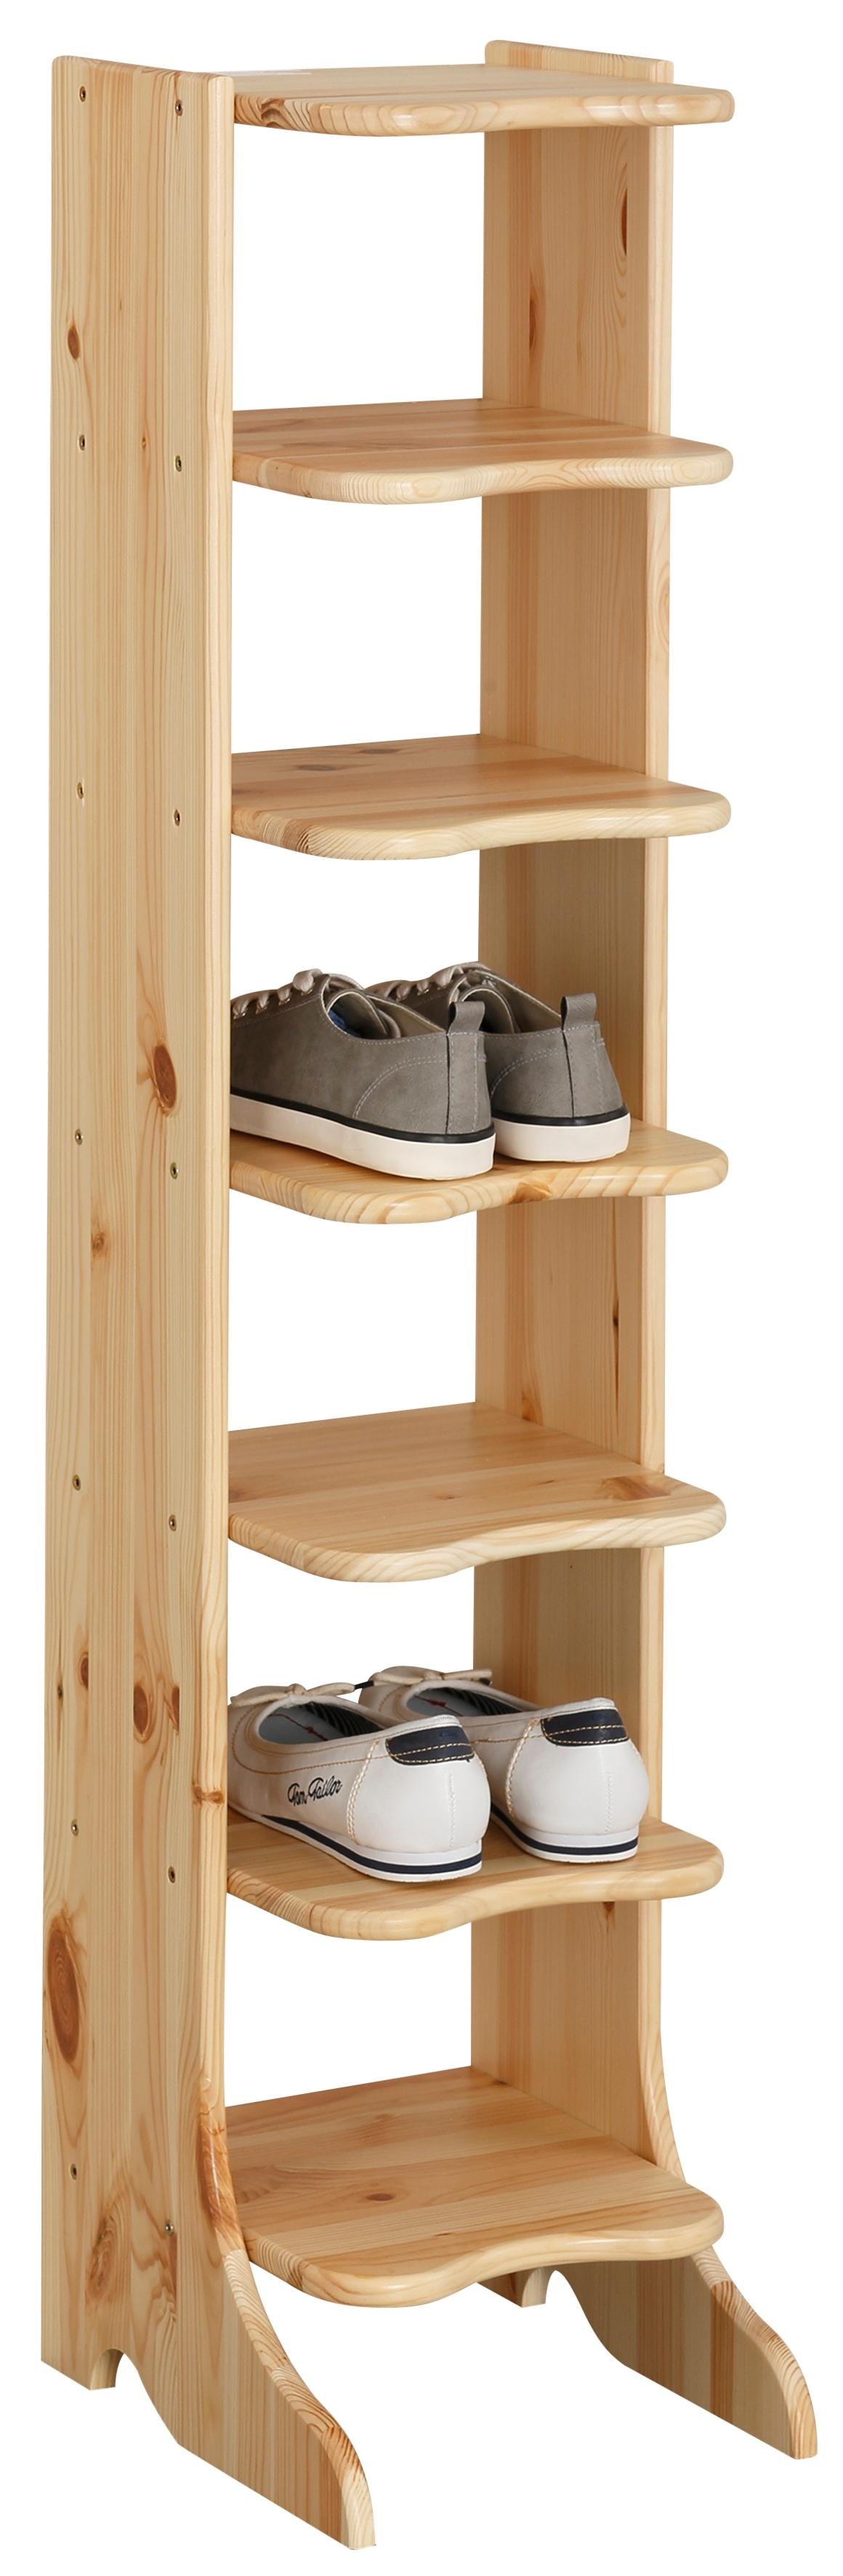 home affaire klein schoenenrek twist makkelijk gevonden otto. Black Bedroom Furniture Sets. Home Design Ideas